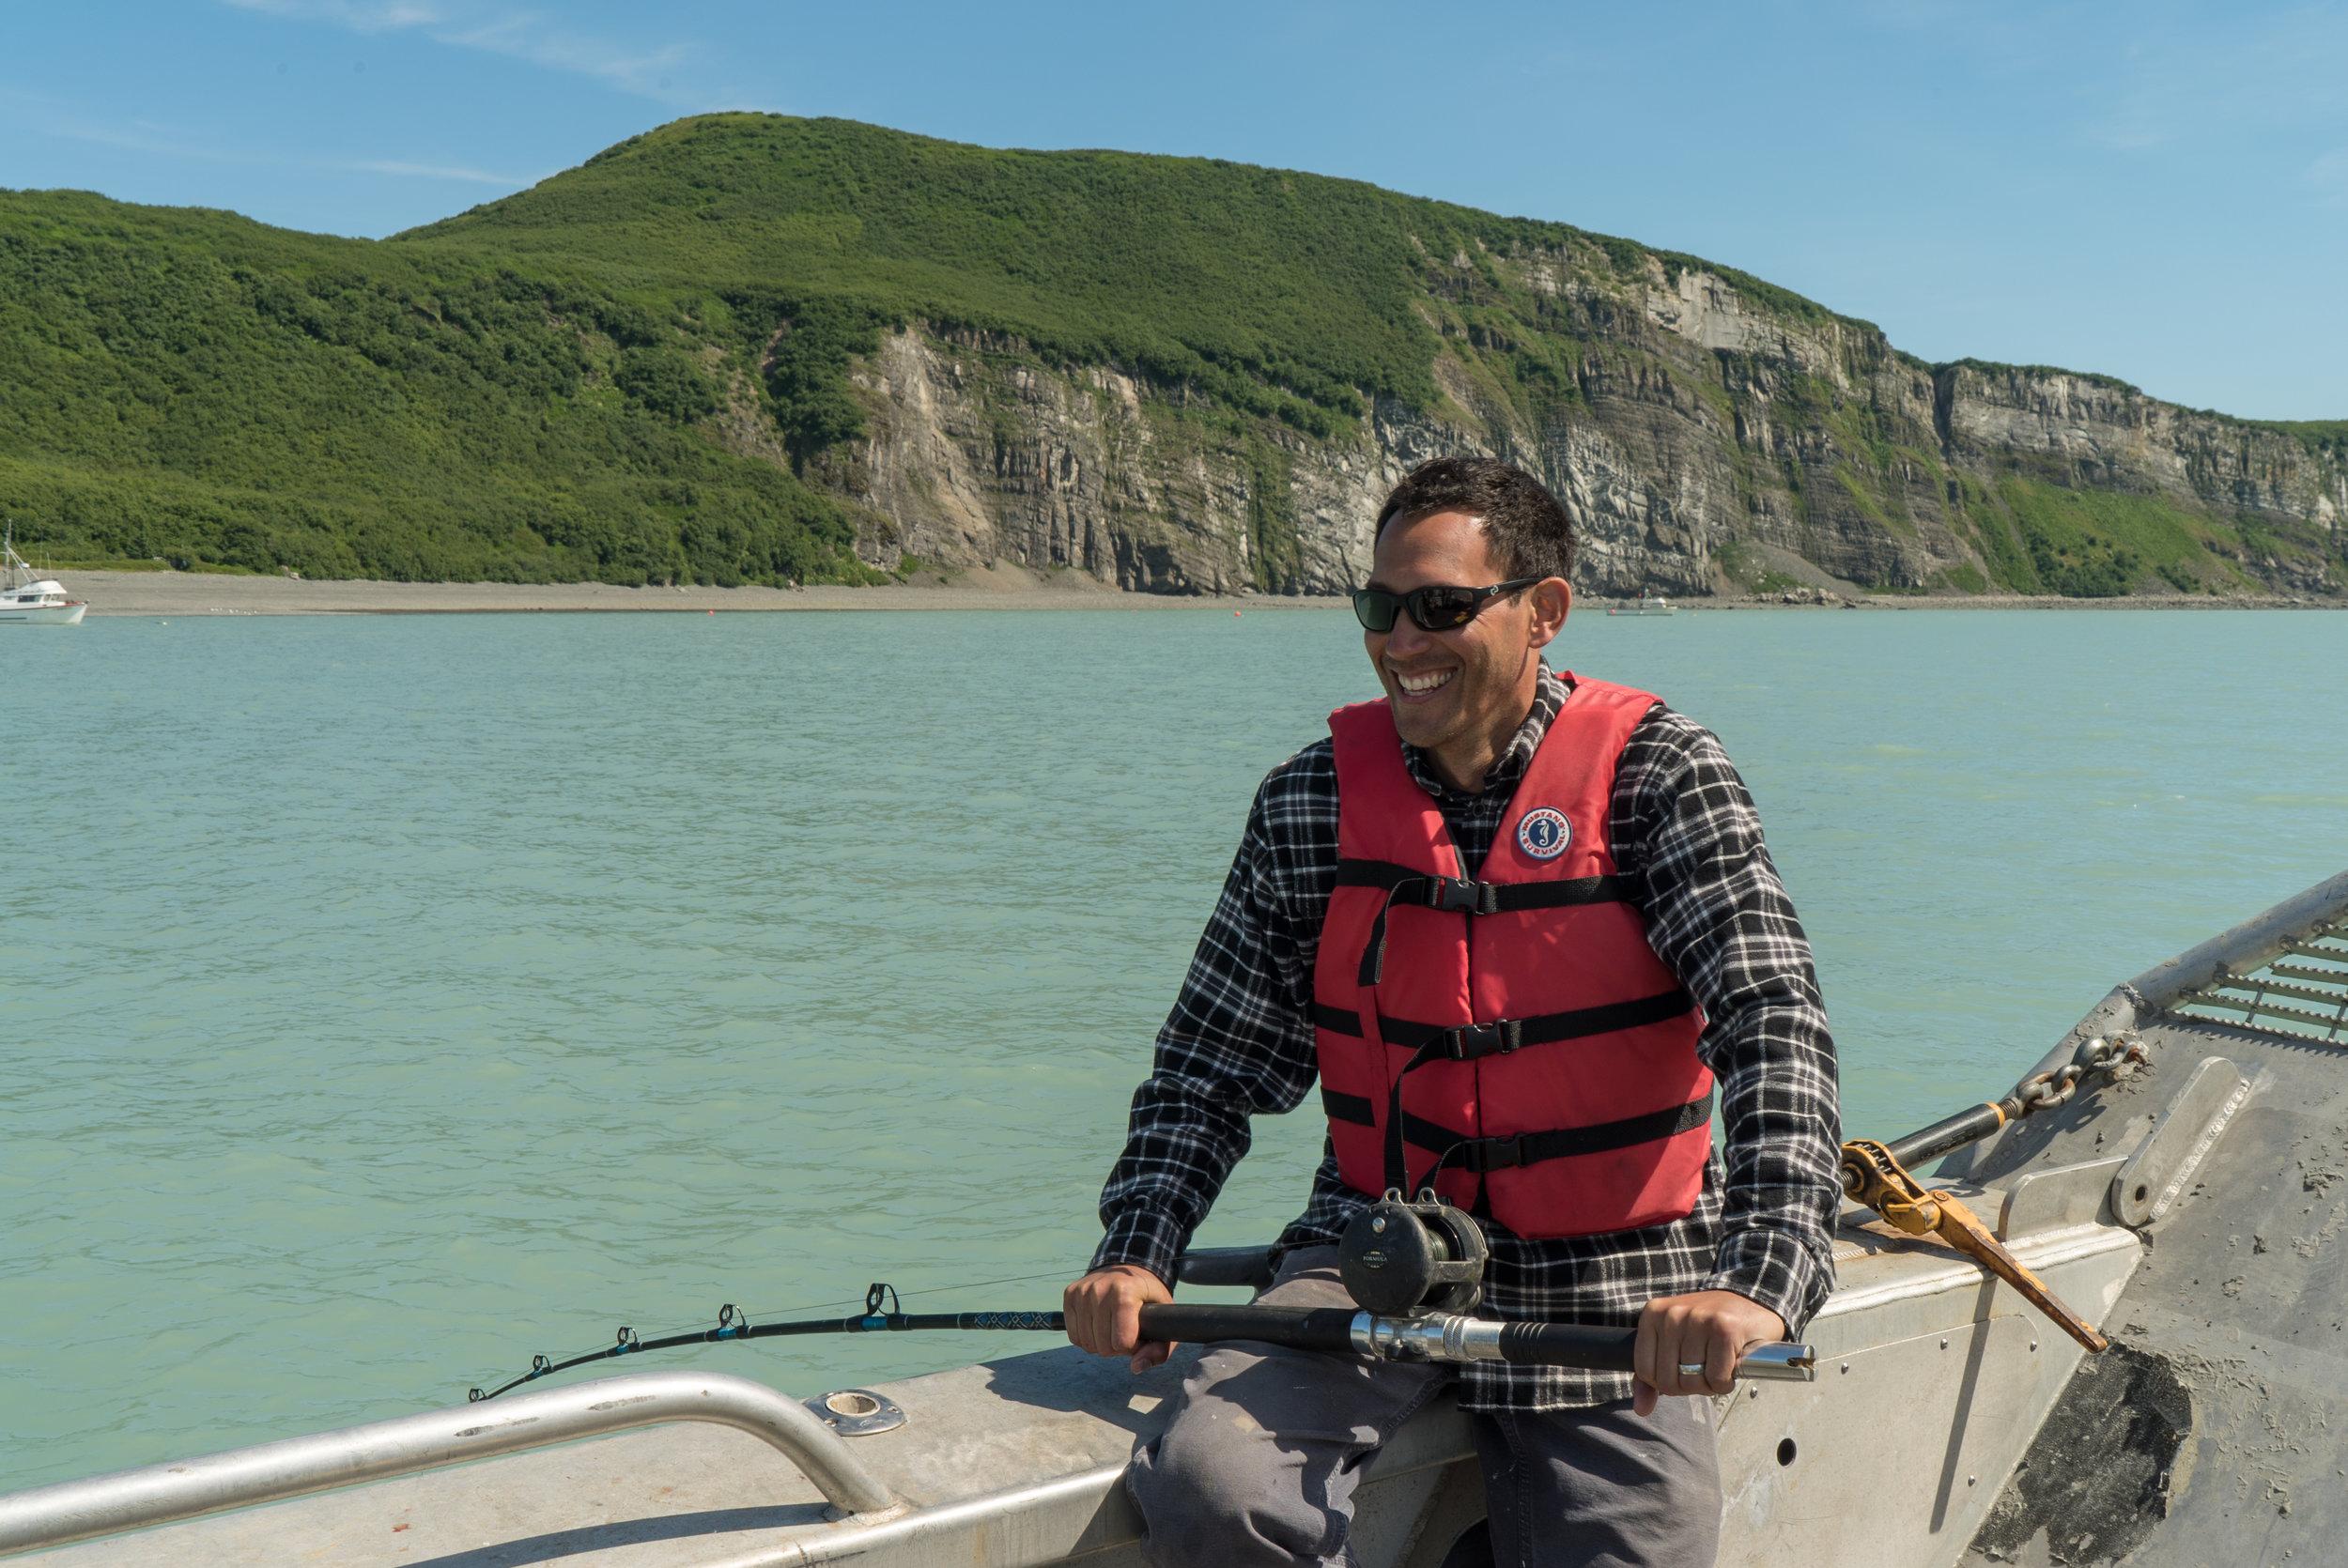 snug-harbor-alaska-Photo-by-Aaron-Minks-DSC06781.jpg